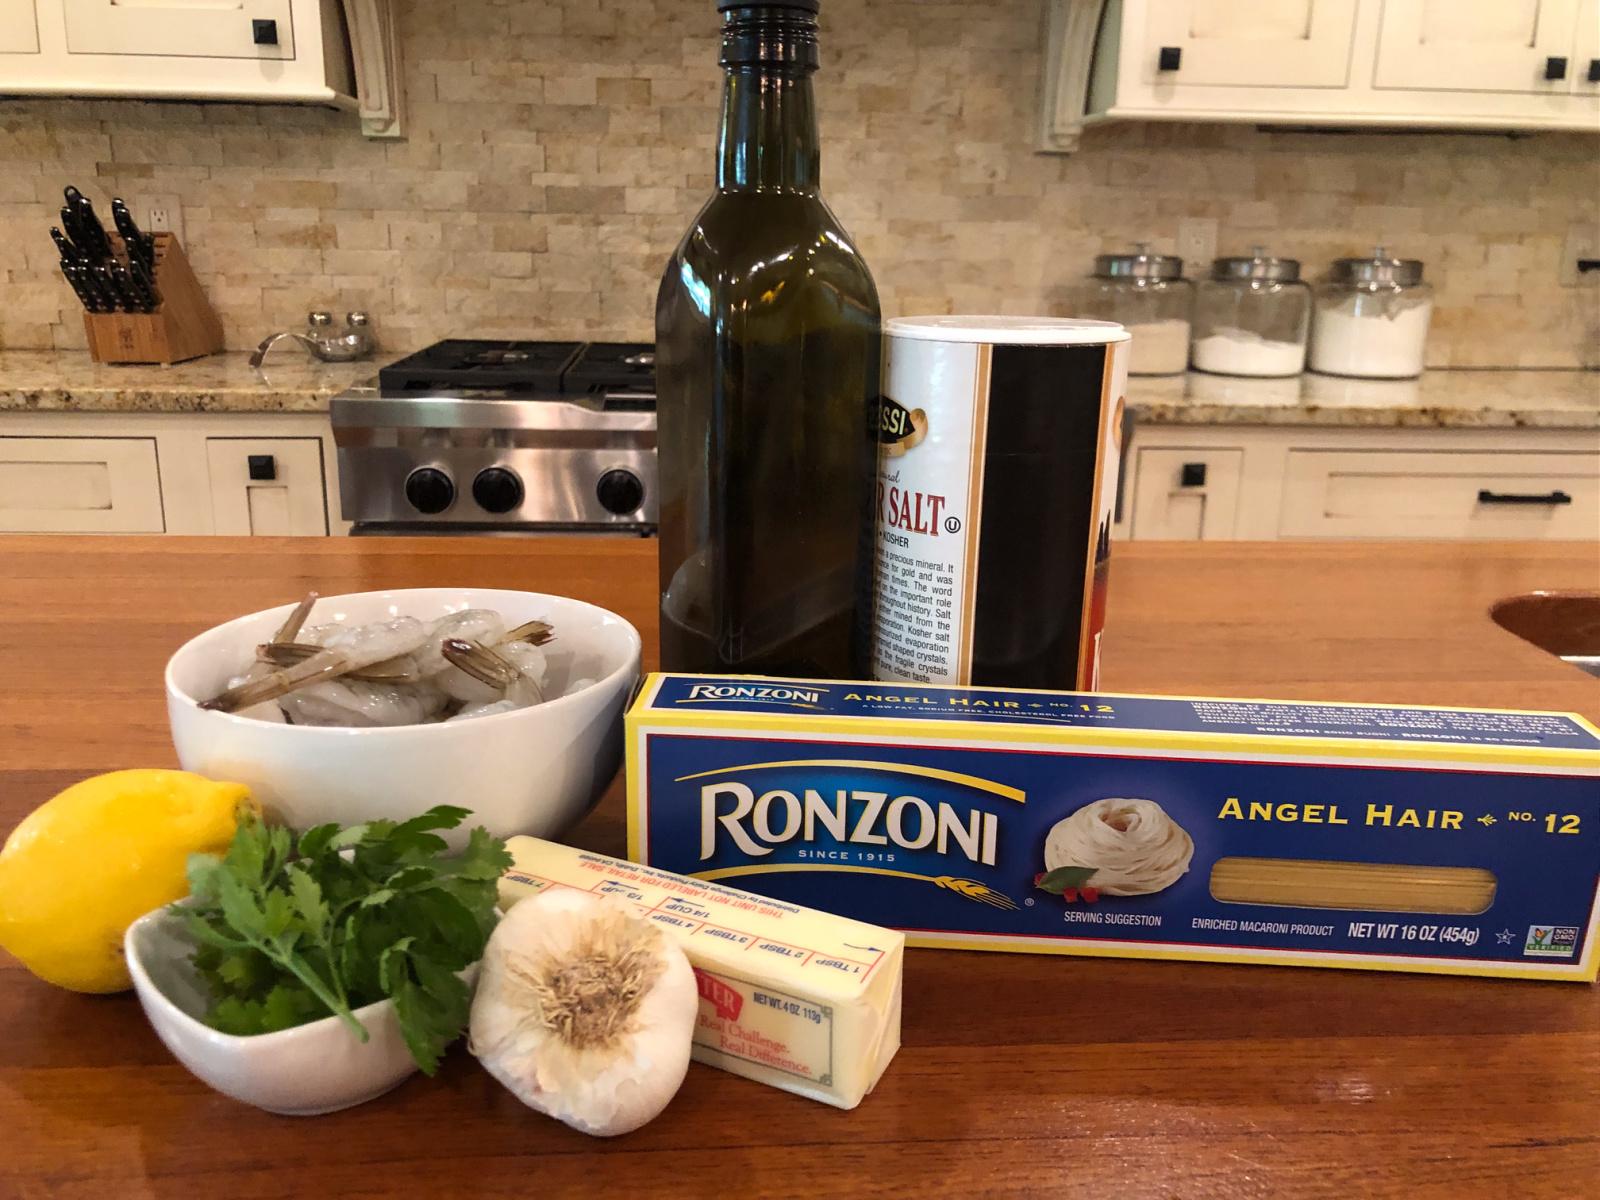 Ronzoni Shrimp Scampi Recipe Draft on I Heart Publix 1